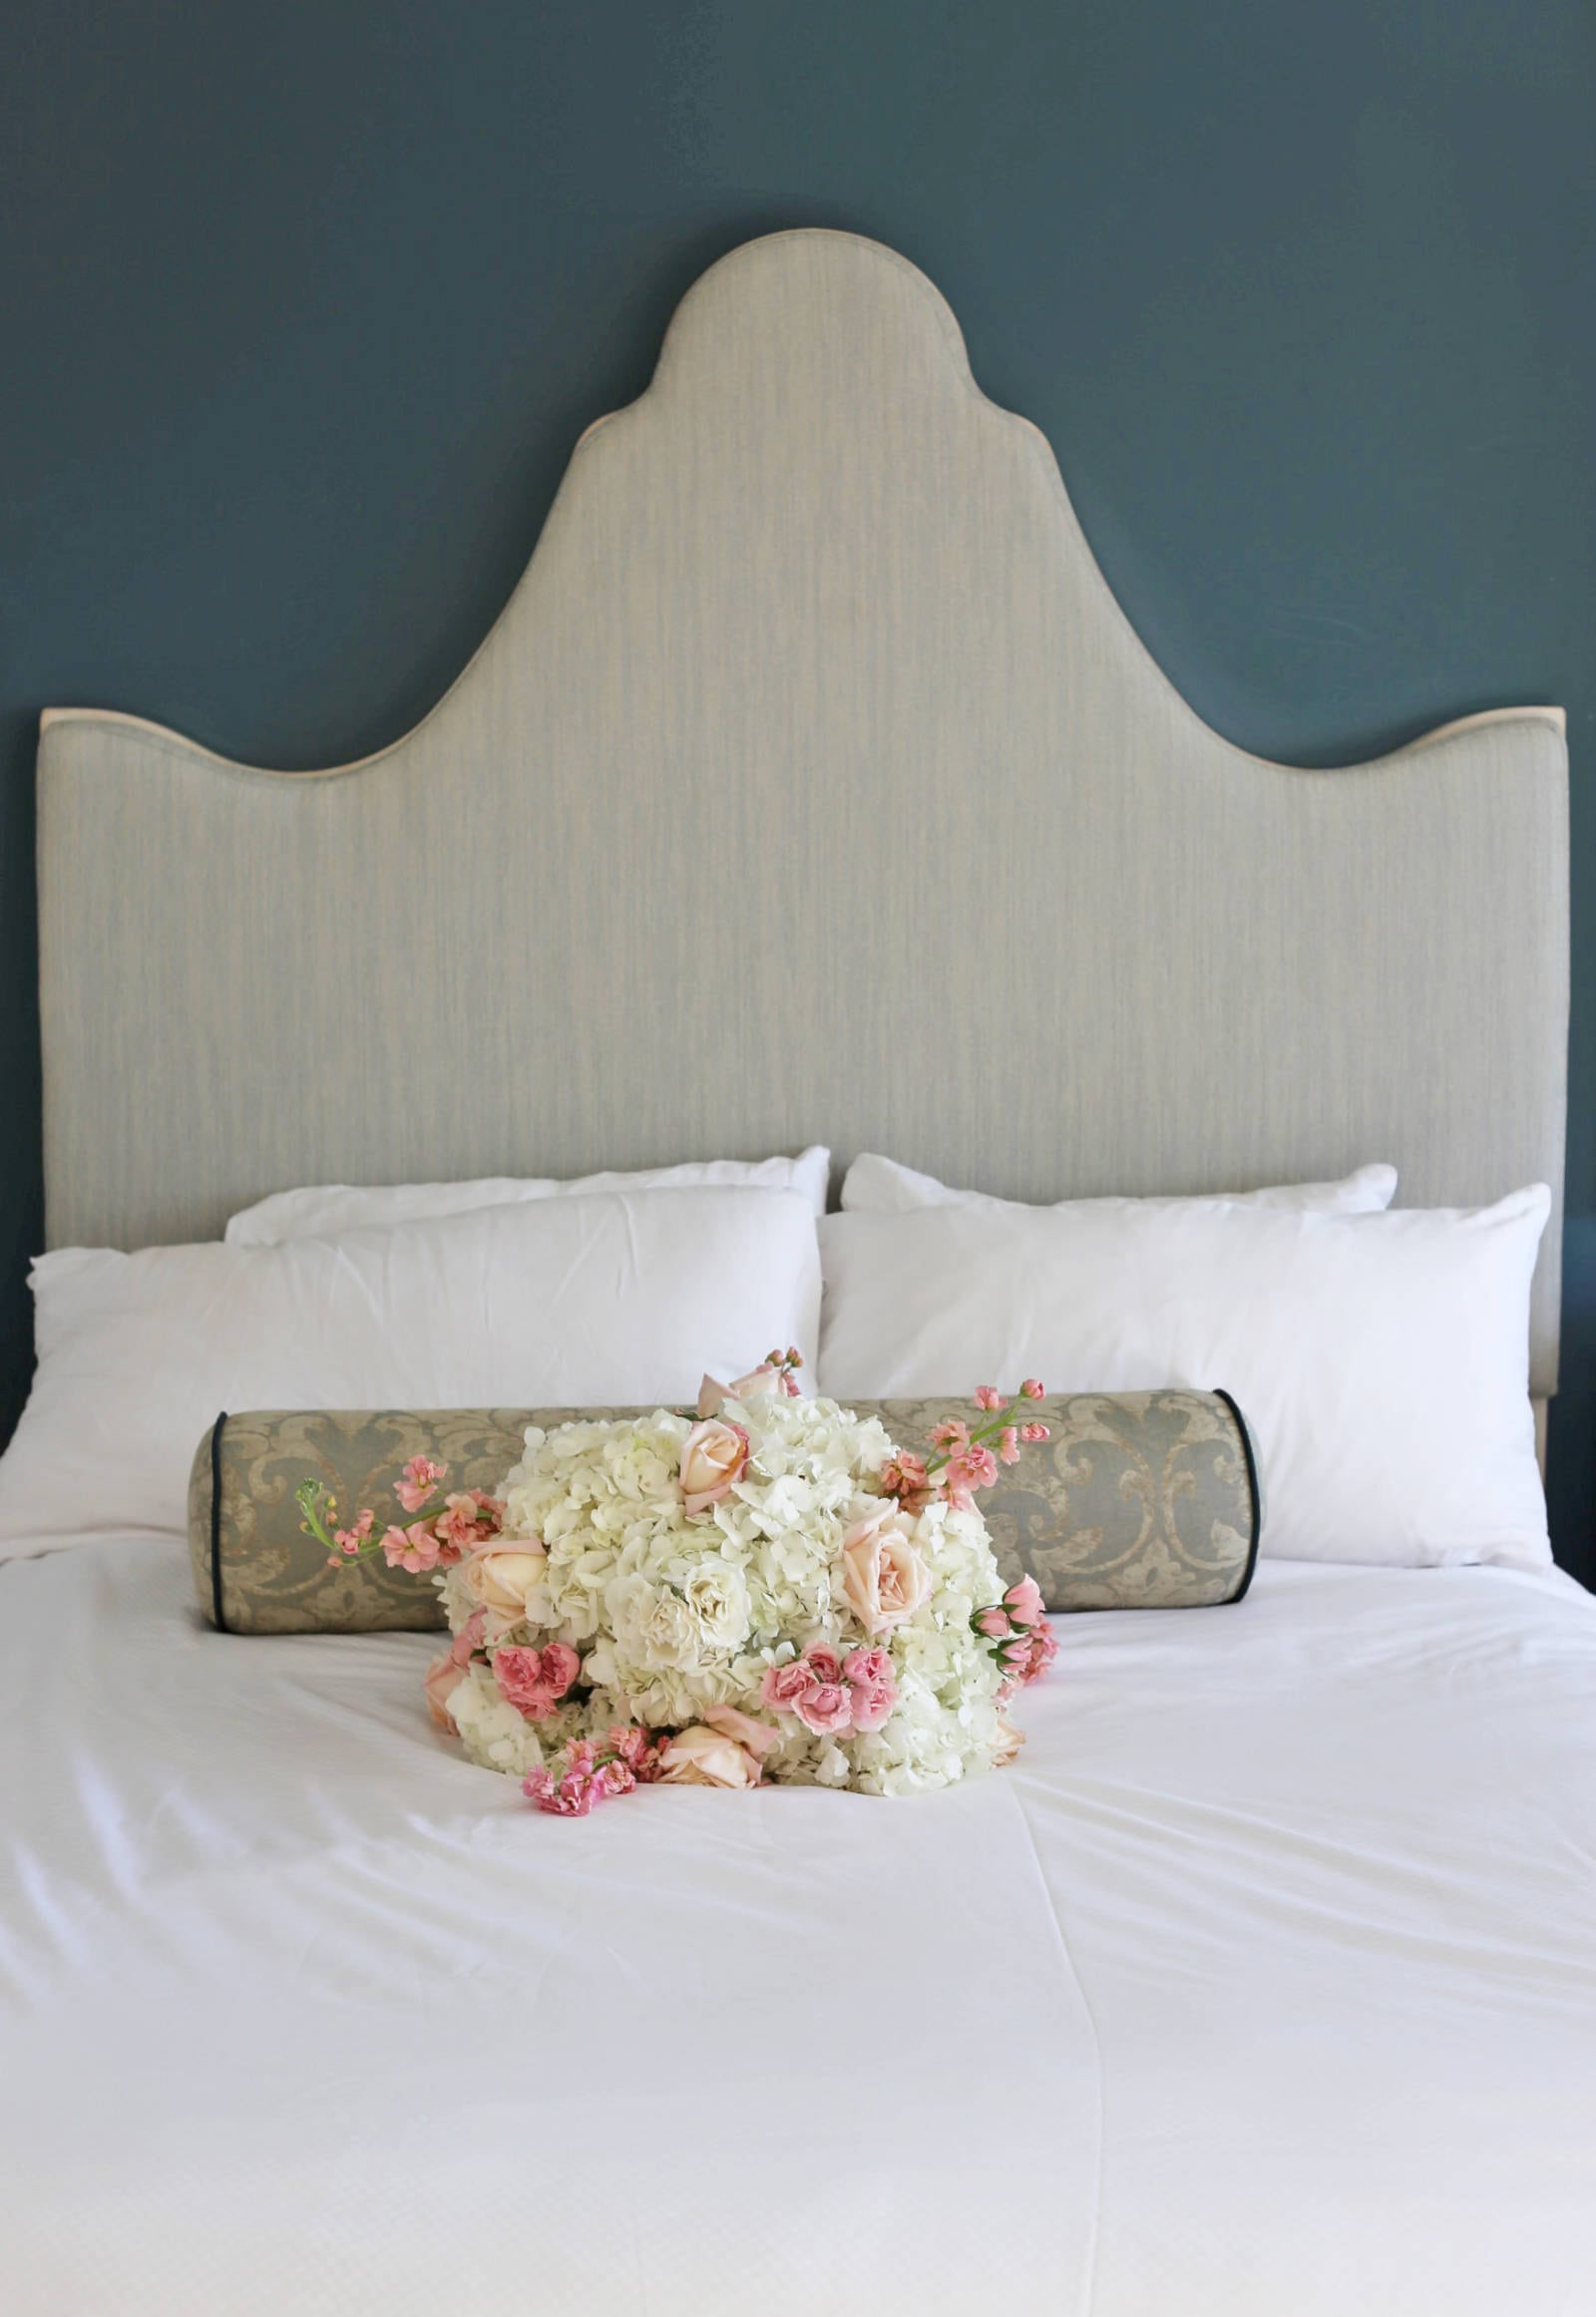 Mash Elle lifestyle blogger | Portofino Bay Hotel | Staycation |vacation in Orlando | Universal